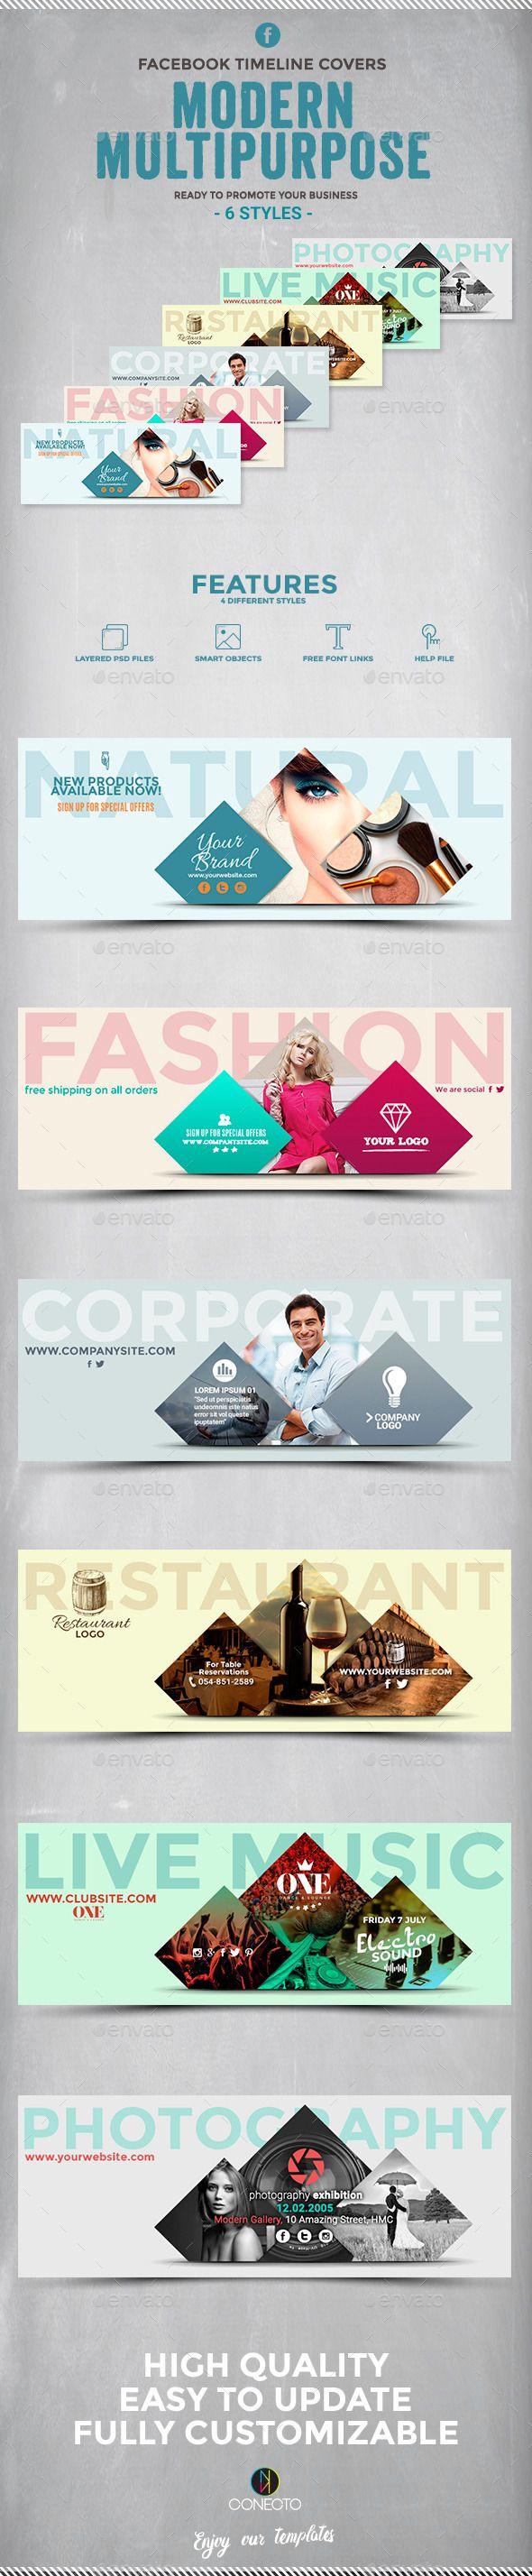 Facebook Timeline Covers - Modern Multipurpose Template #design Download: http://graphicriver.net/item/facebook-timeline-covers-modern-multipurpose/12312225?ref=ksioks